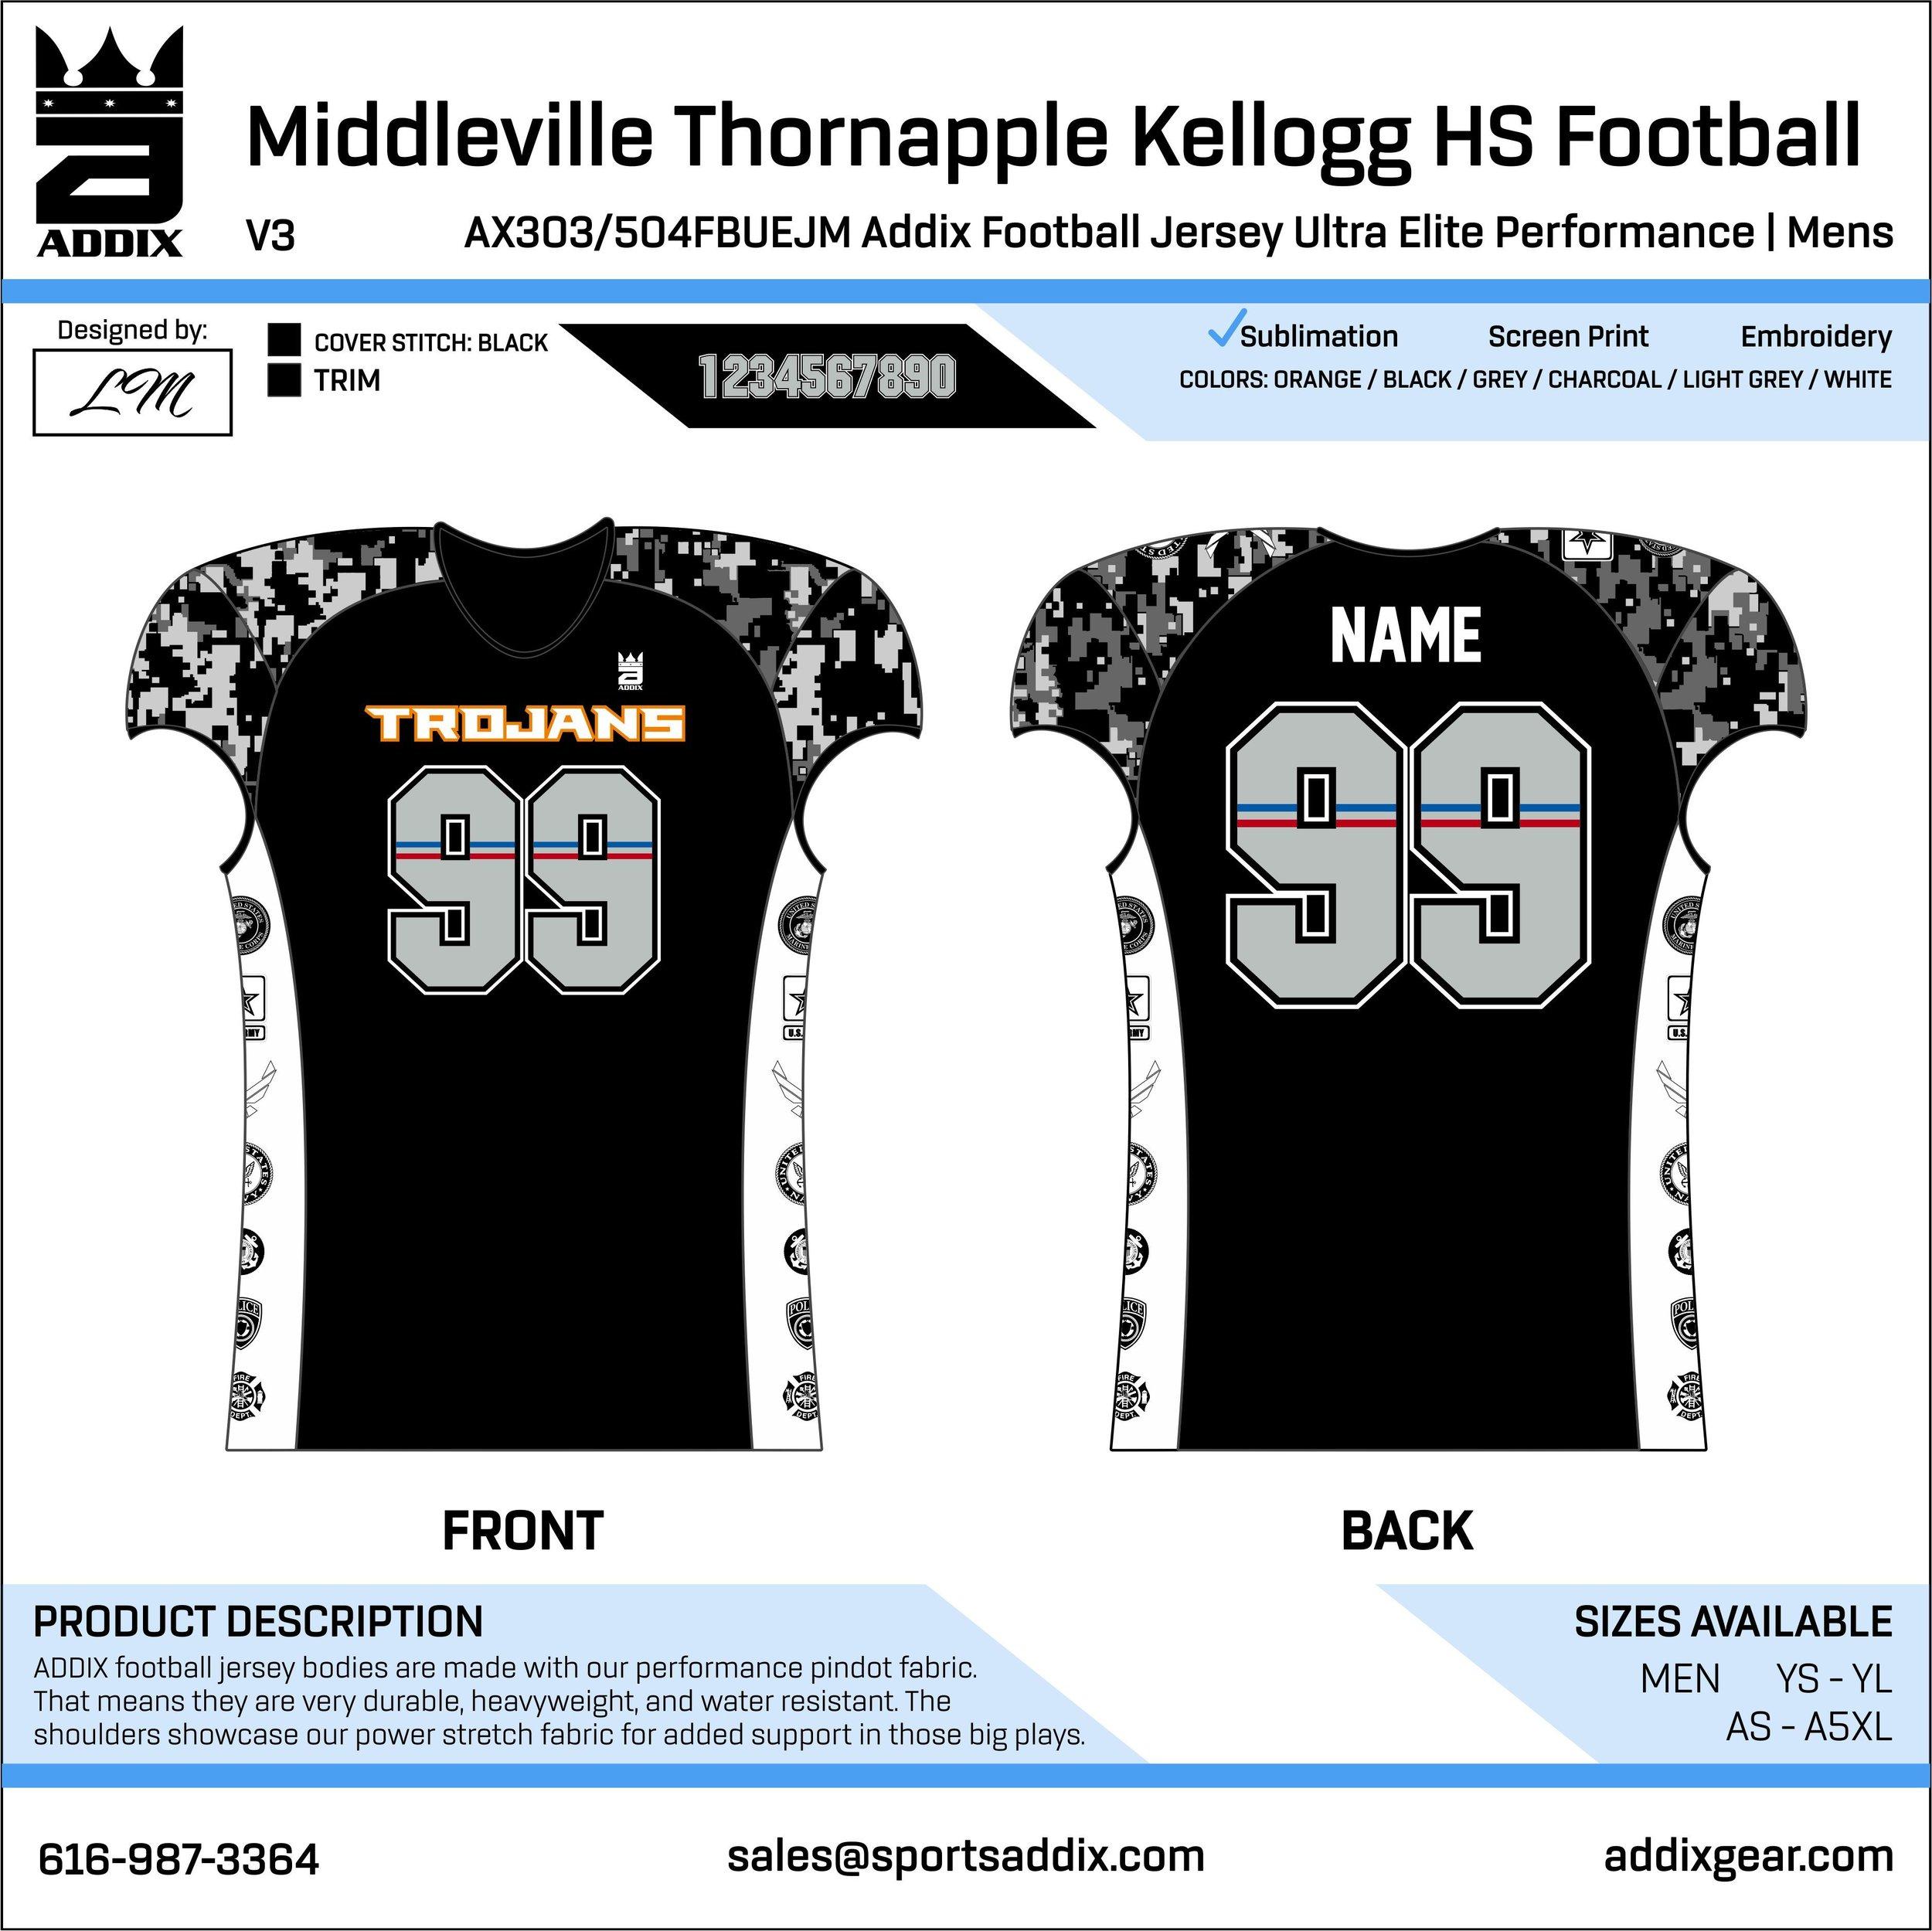 Middleville Thornapple Kellogg HS Football_2019_6-5_LM_EUP Jersey_v3.jpg